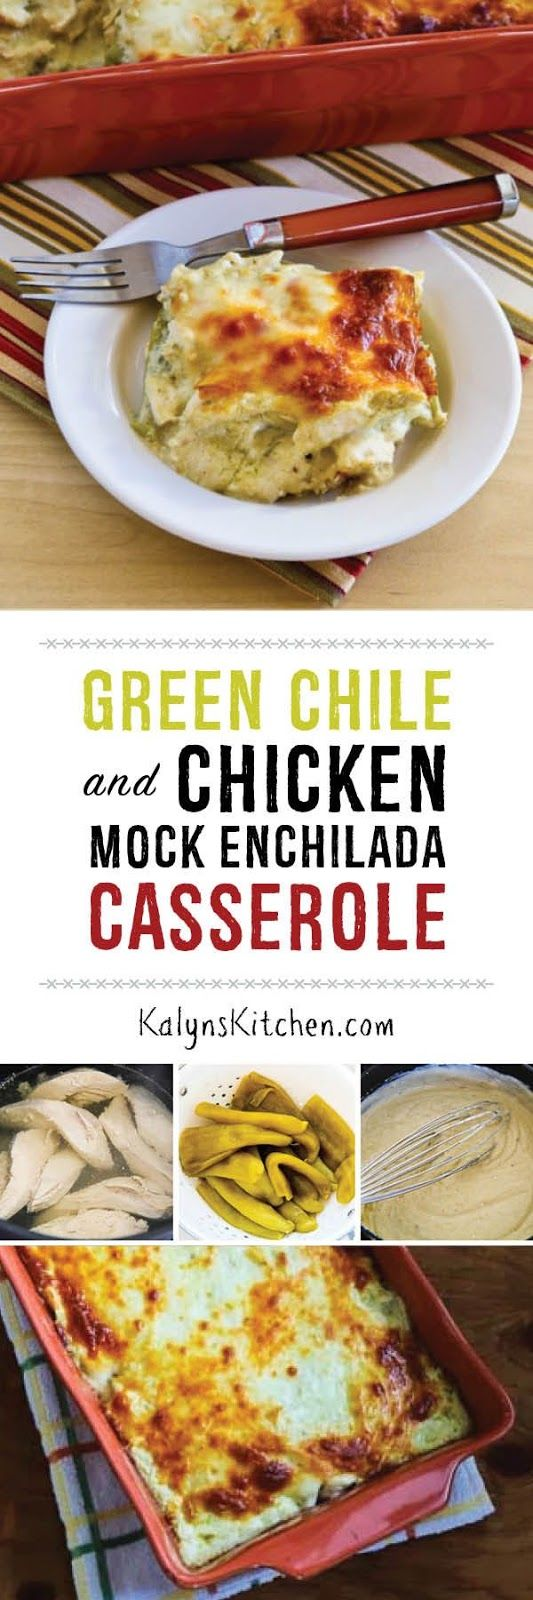 Green Chile and Chicken Mock Enchilada Casserole [found on KalynsKitchen.com]